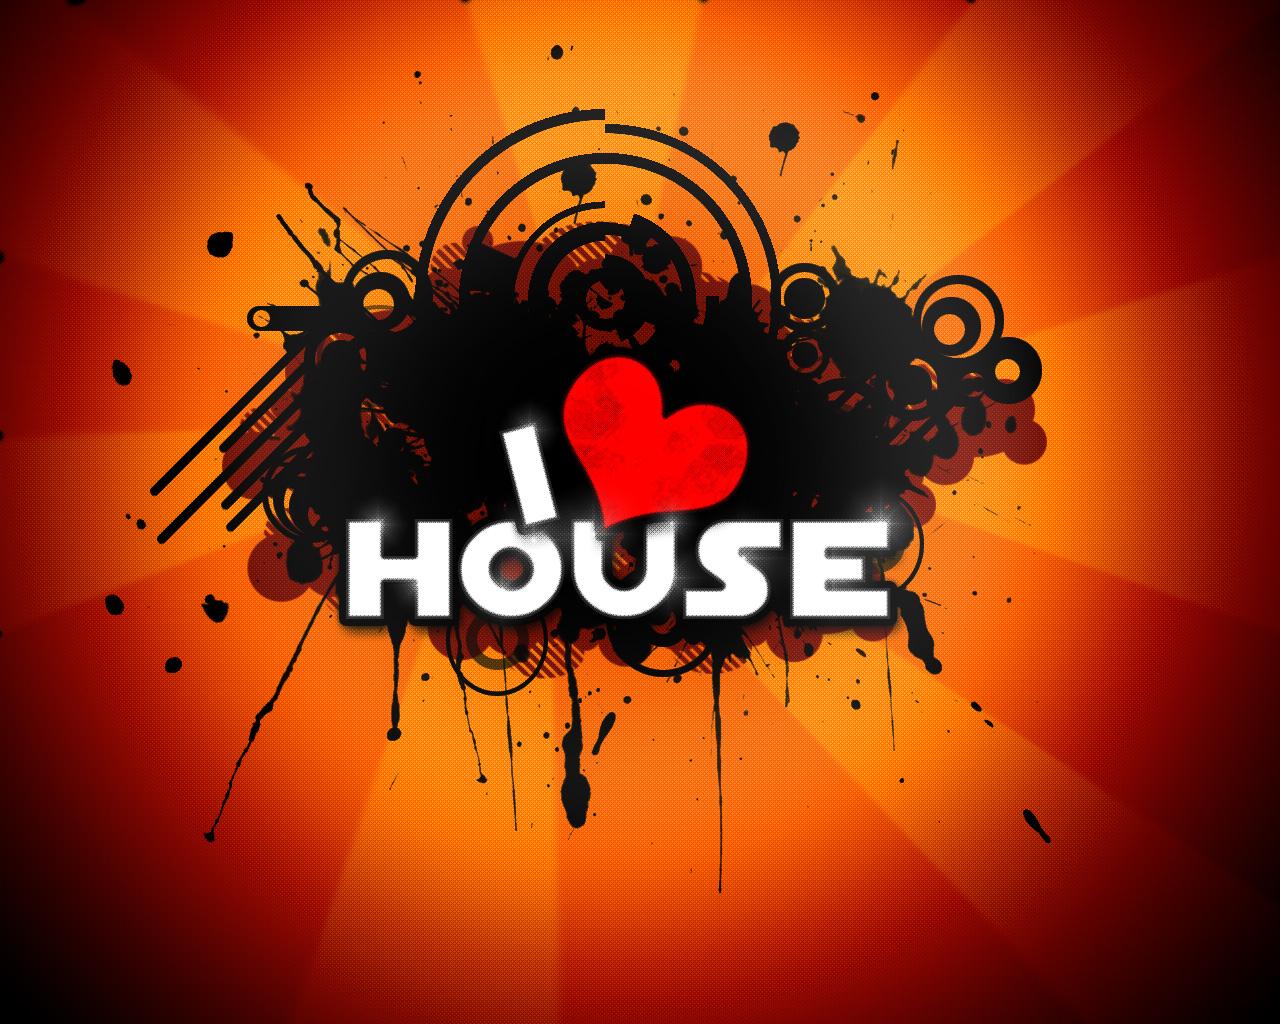 http://1.bp.blogspot.com/-MakP6lhga1E/TiRCmHM2jxI/AAAAAAAAATo/NqH6Bgb_Gx0/s1600/I_love_House_wallpaper_by_NickoTyn.jpg